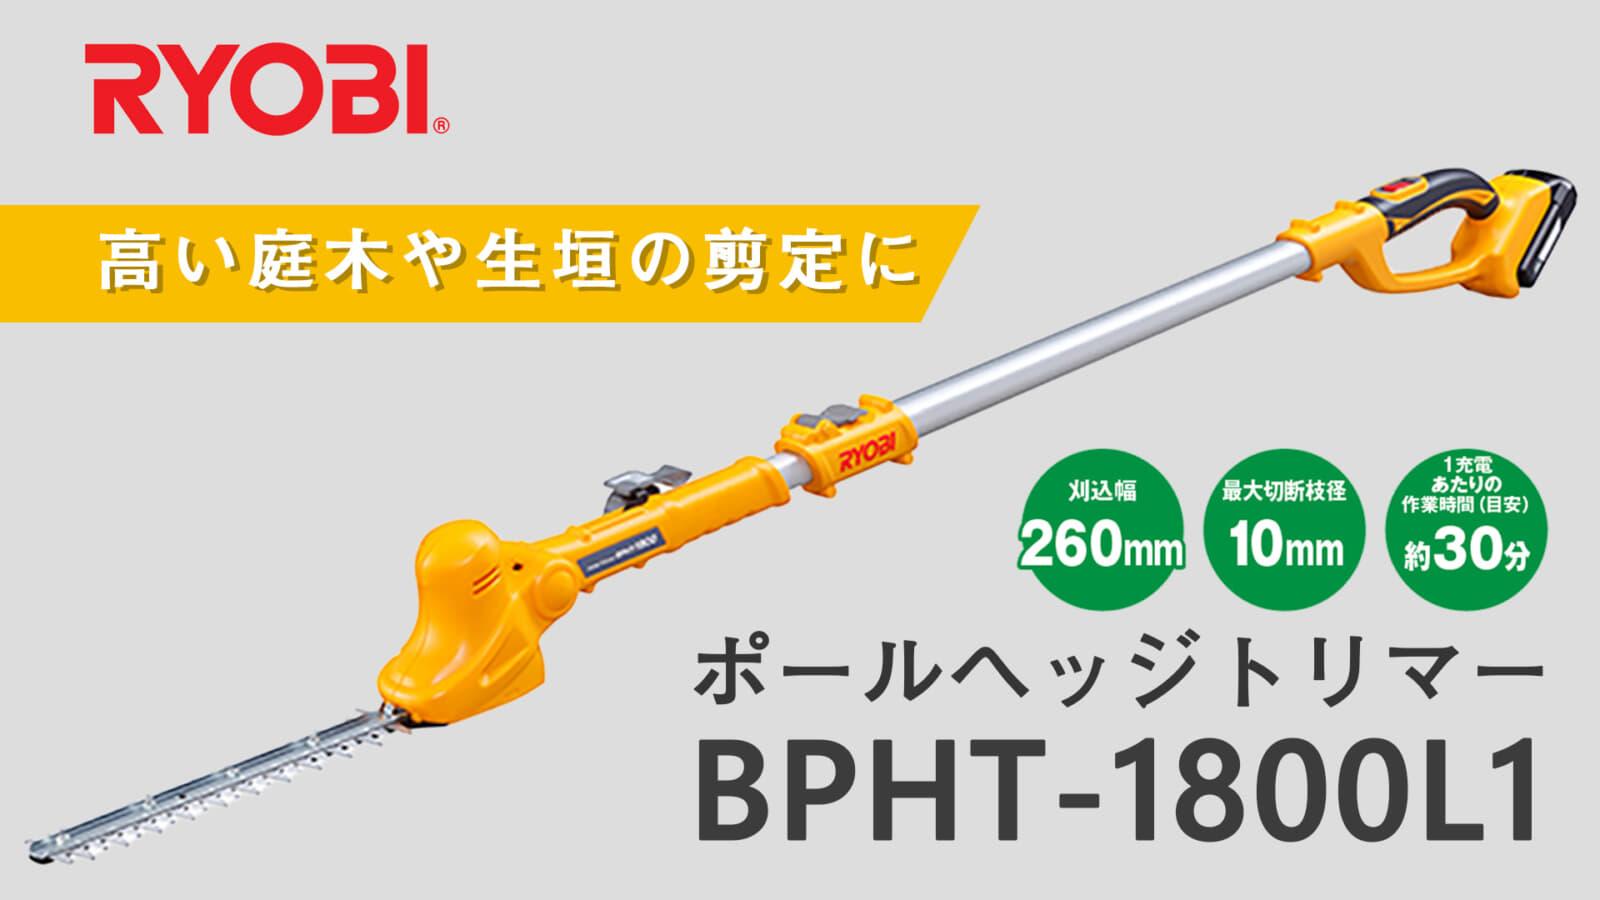 RYOBI BPHT-1800L1 充電式ポールヘッジトリマーを発売、伸縮式ポールと前後120°可動する首振りヘッド